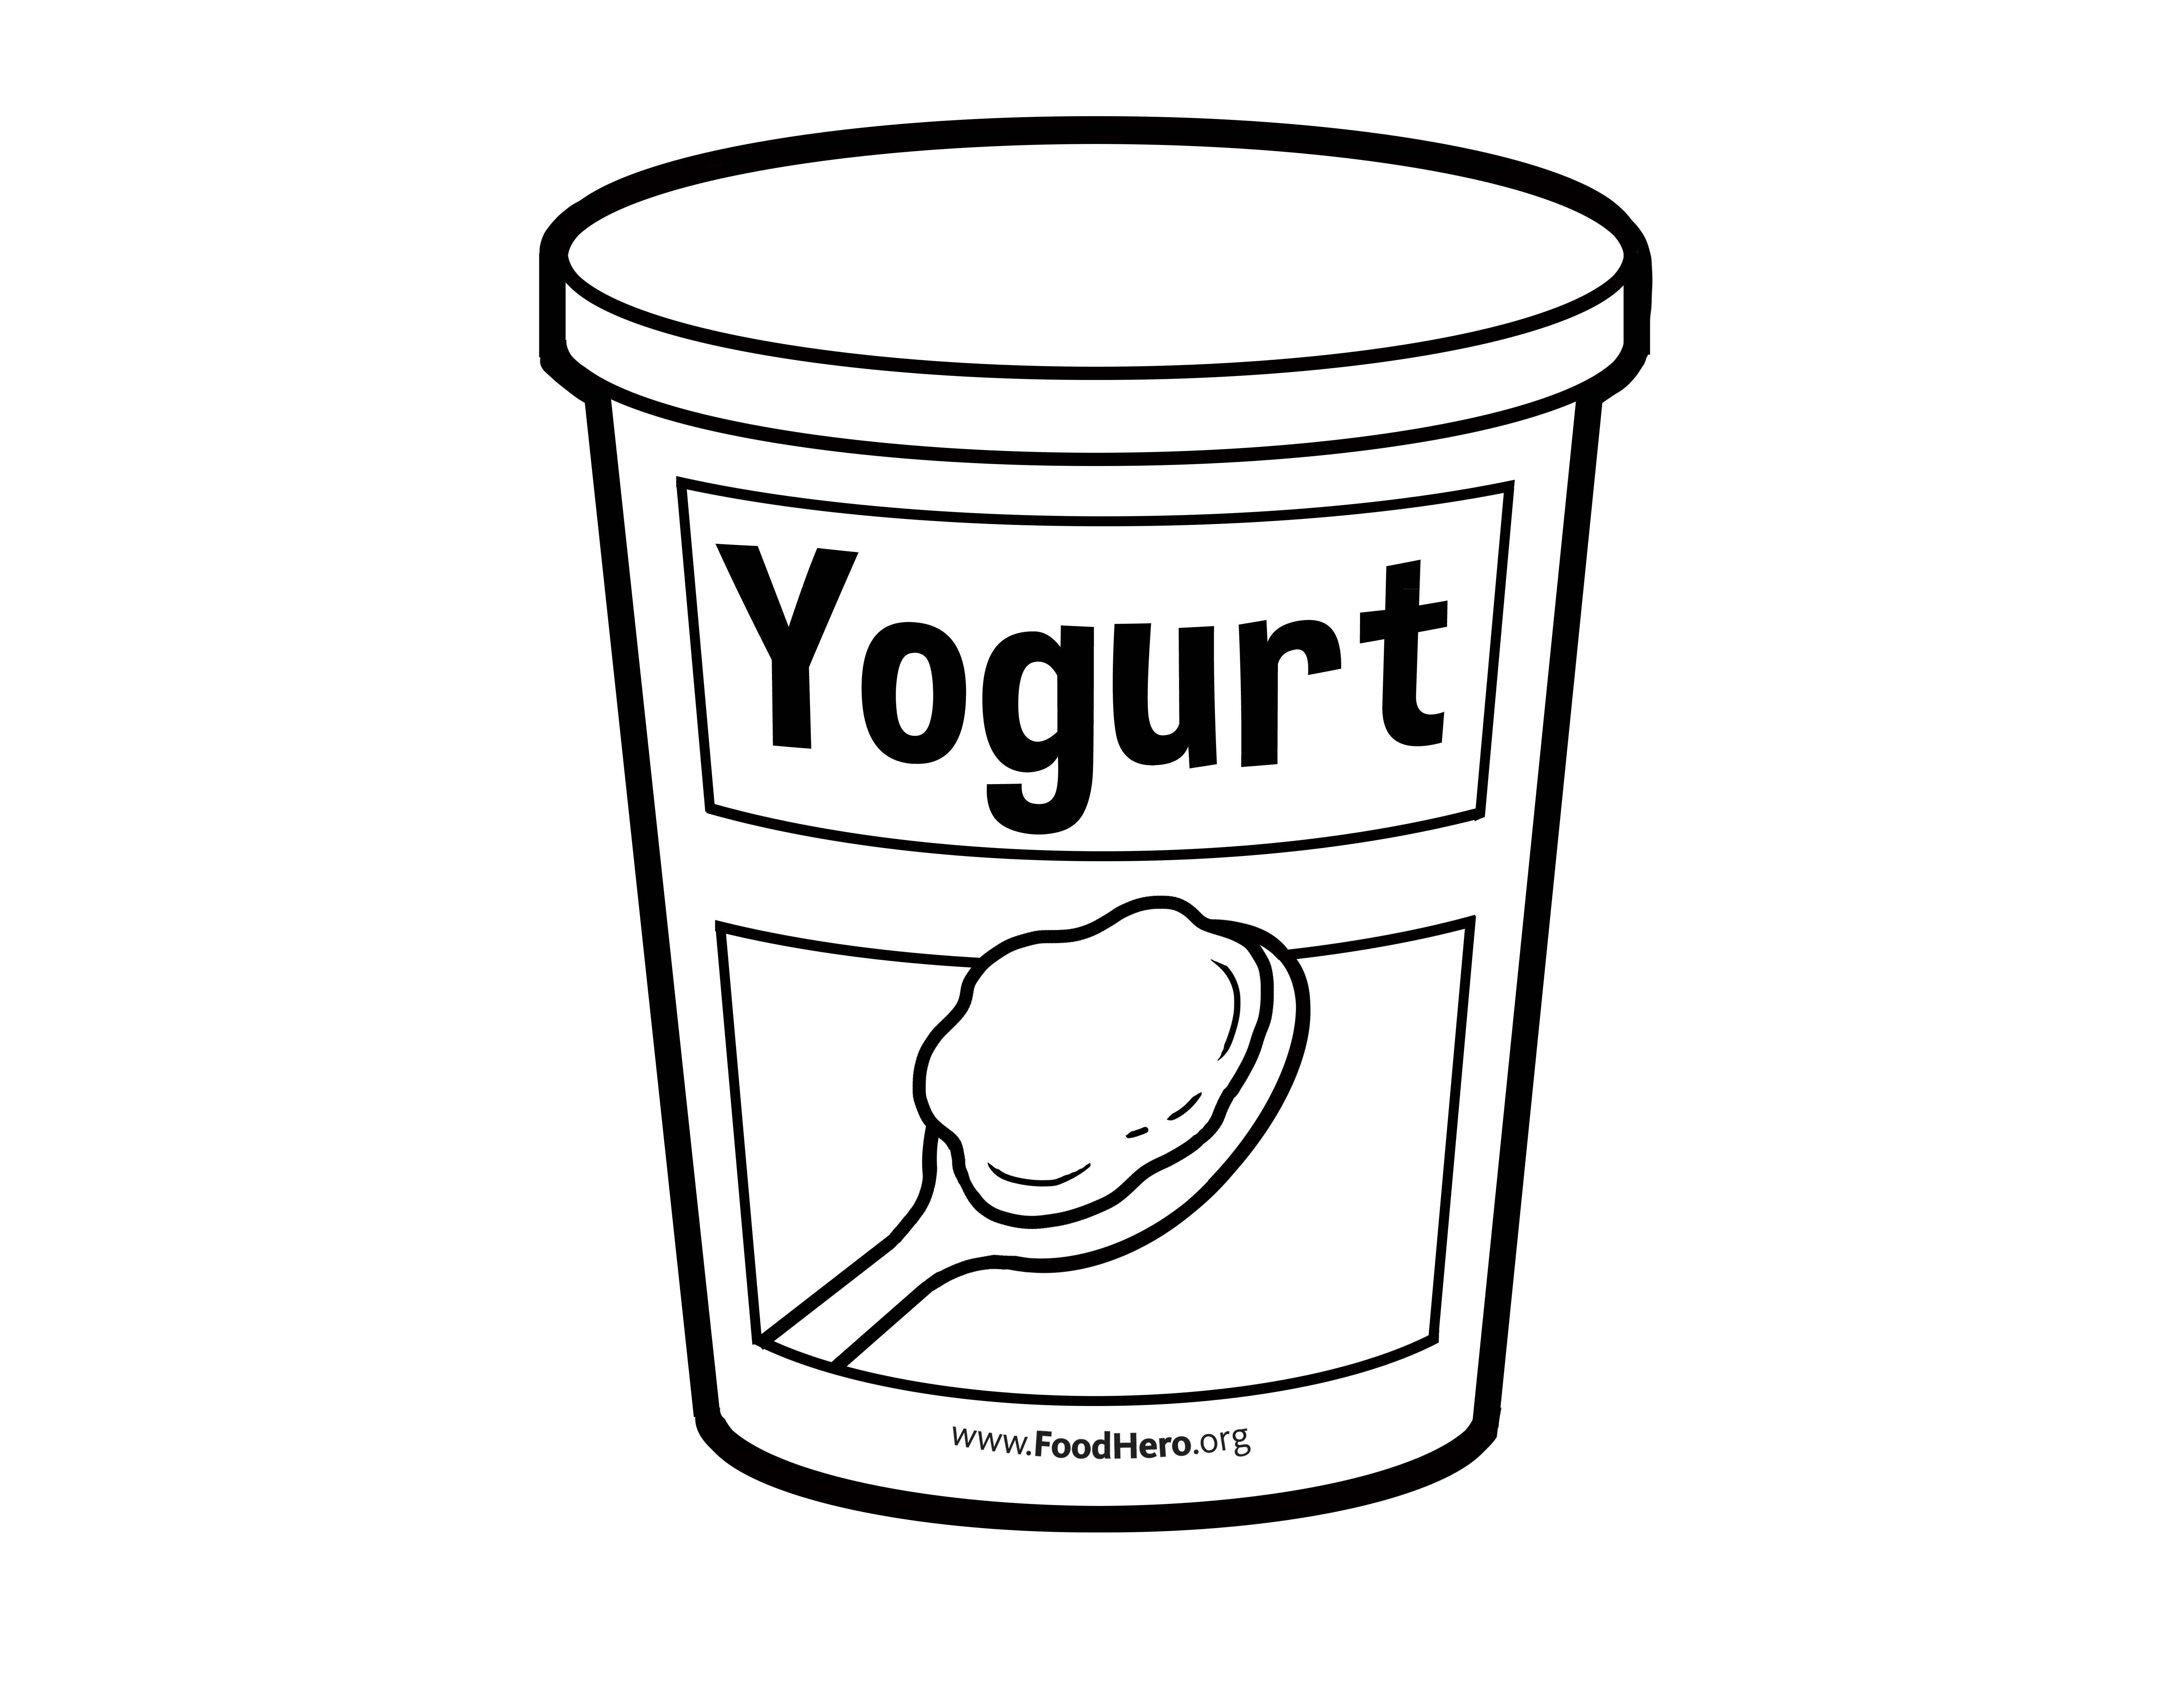 Yogurt Illustration Yogurt Snake Drawing Drawing For Kids Easy Drawings